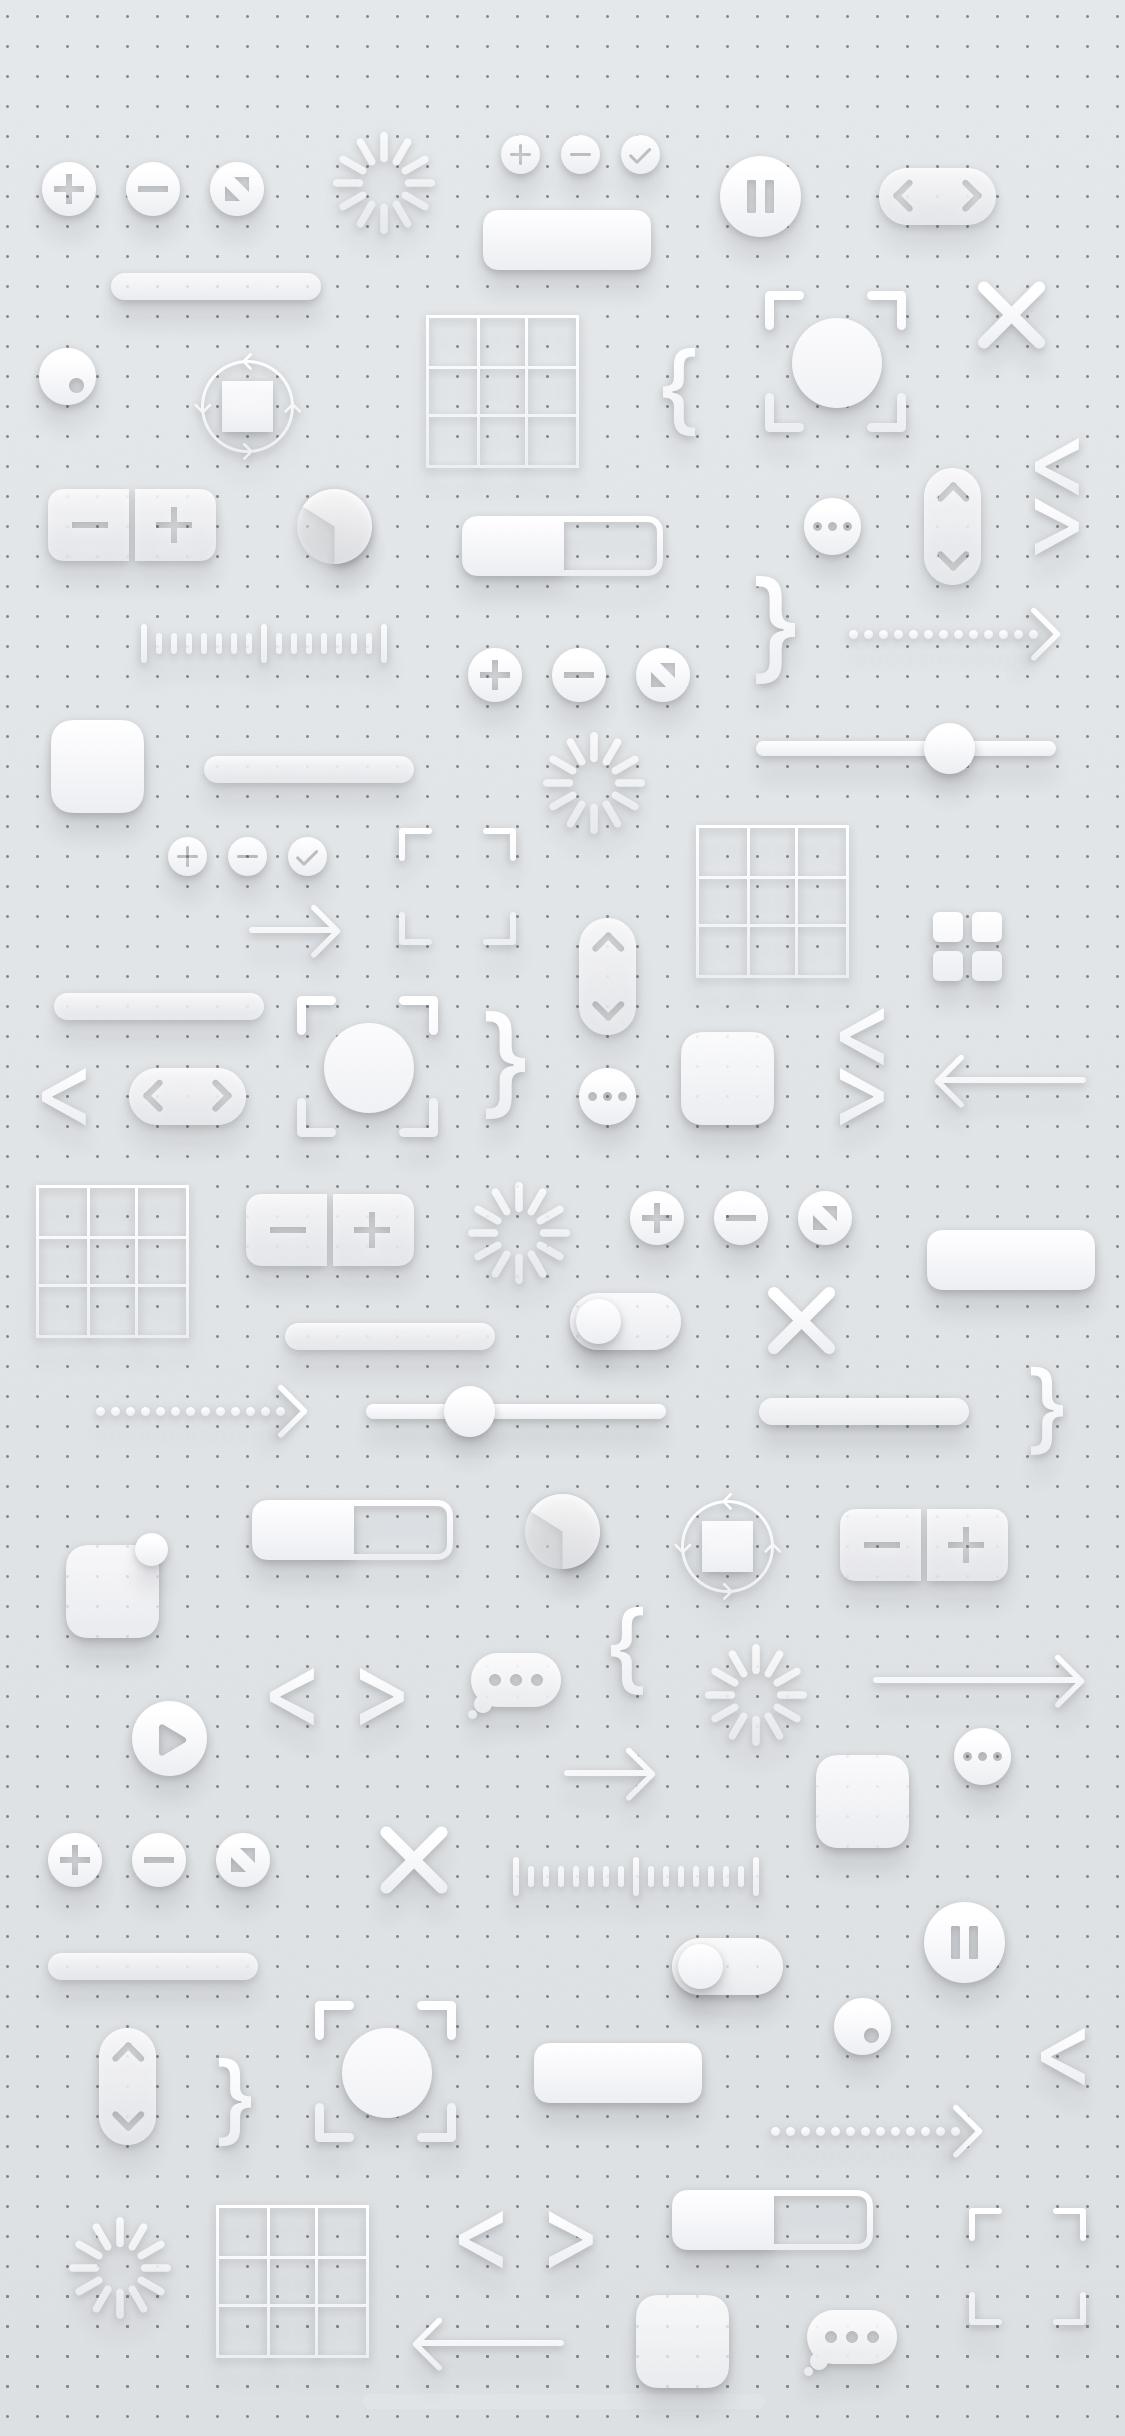 Iphone壁紙 Wwdc2018 デザインのiphone用壁紙公開 Iphone X用も